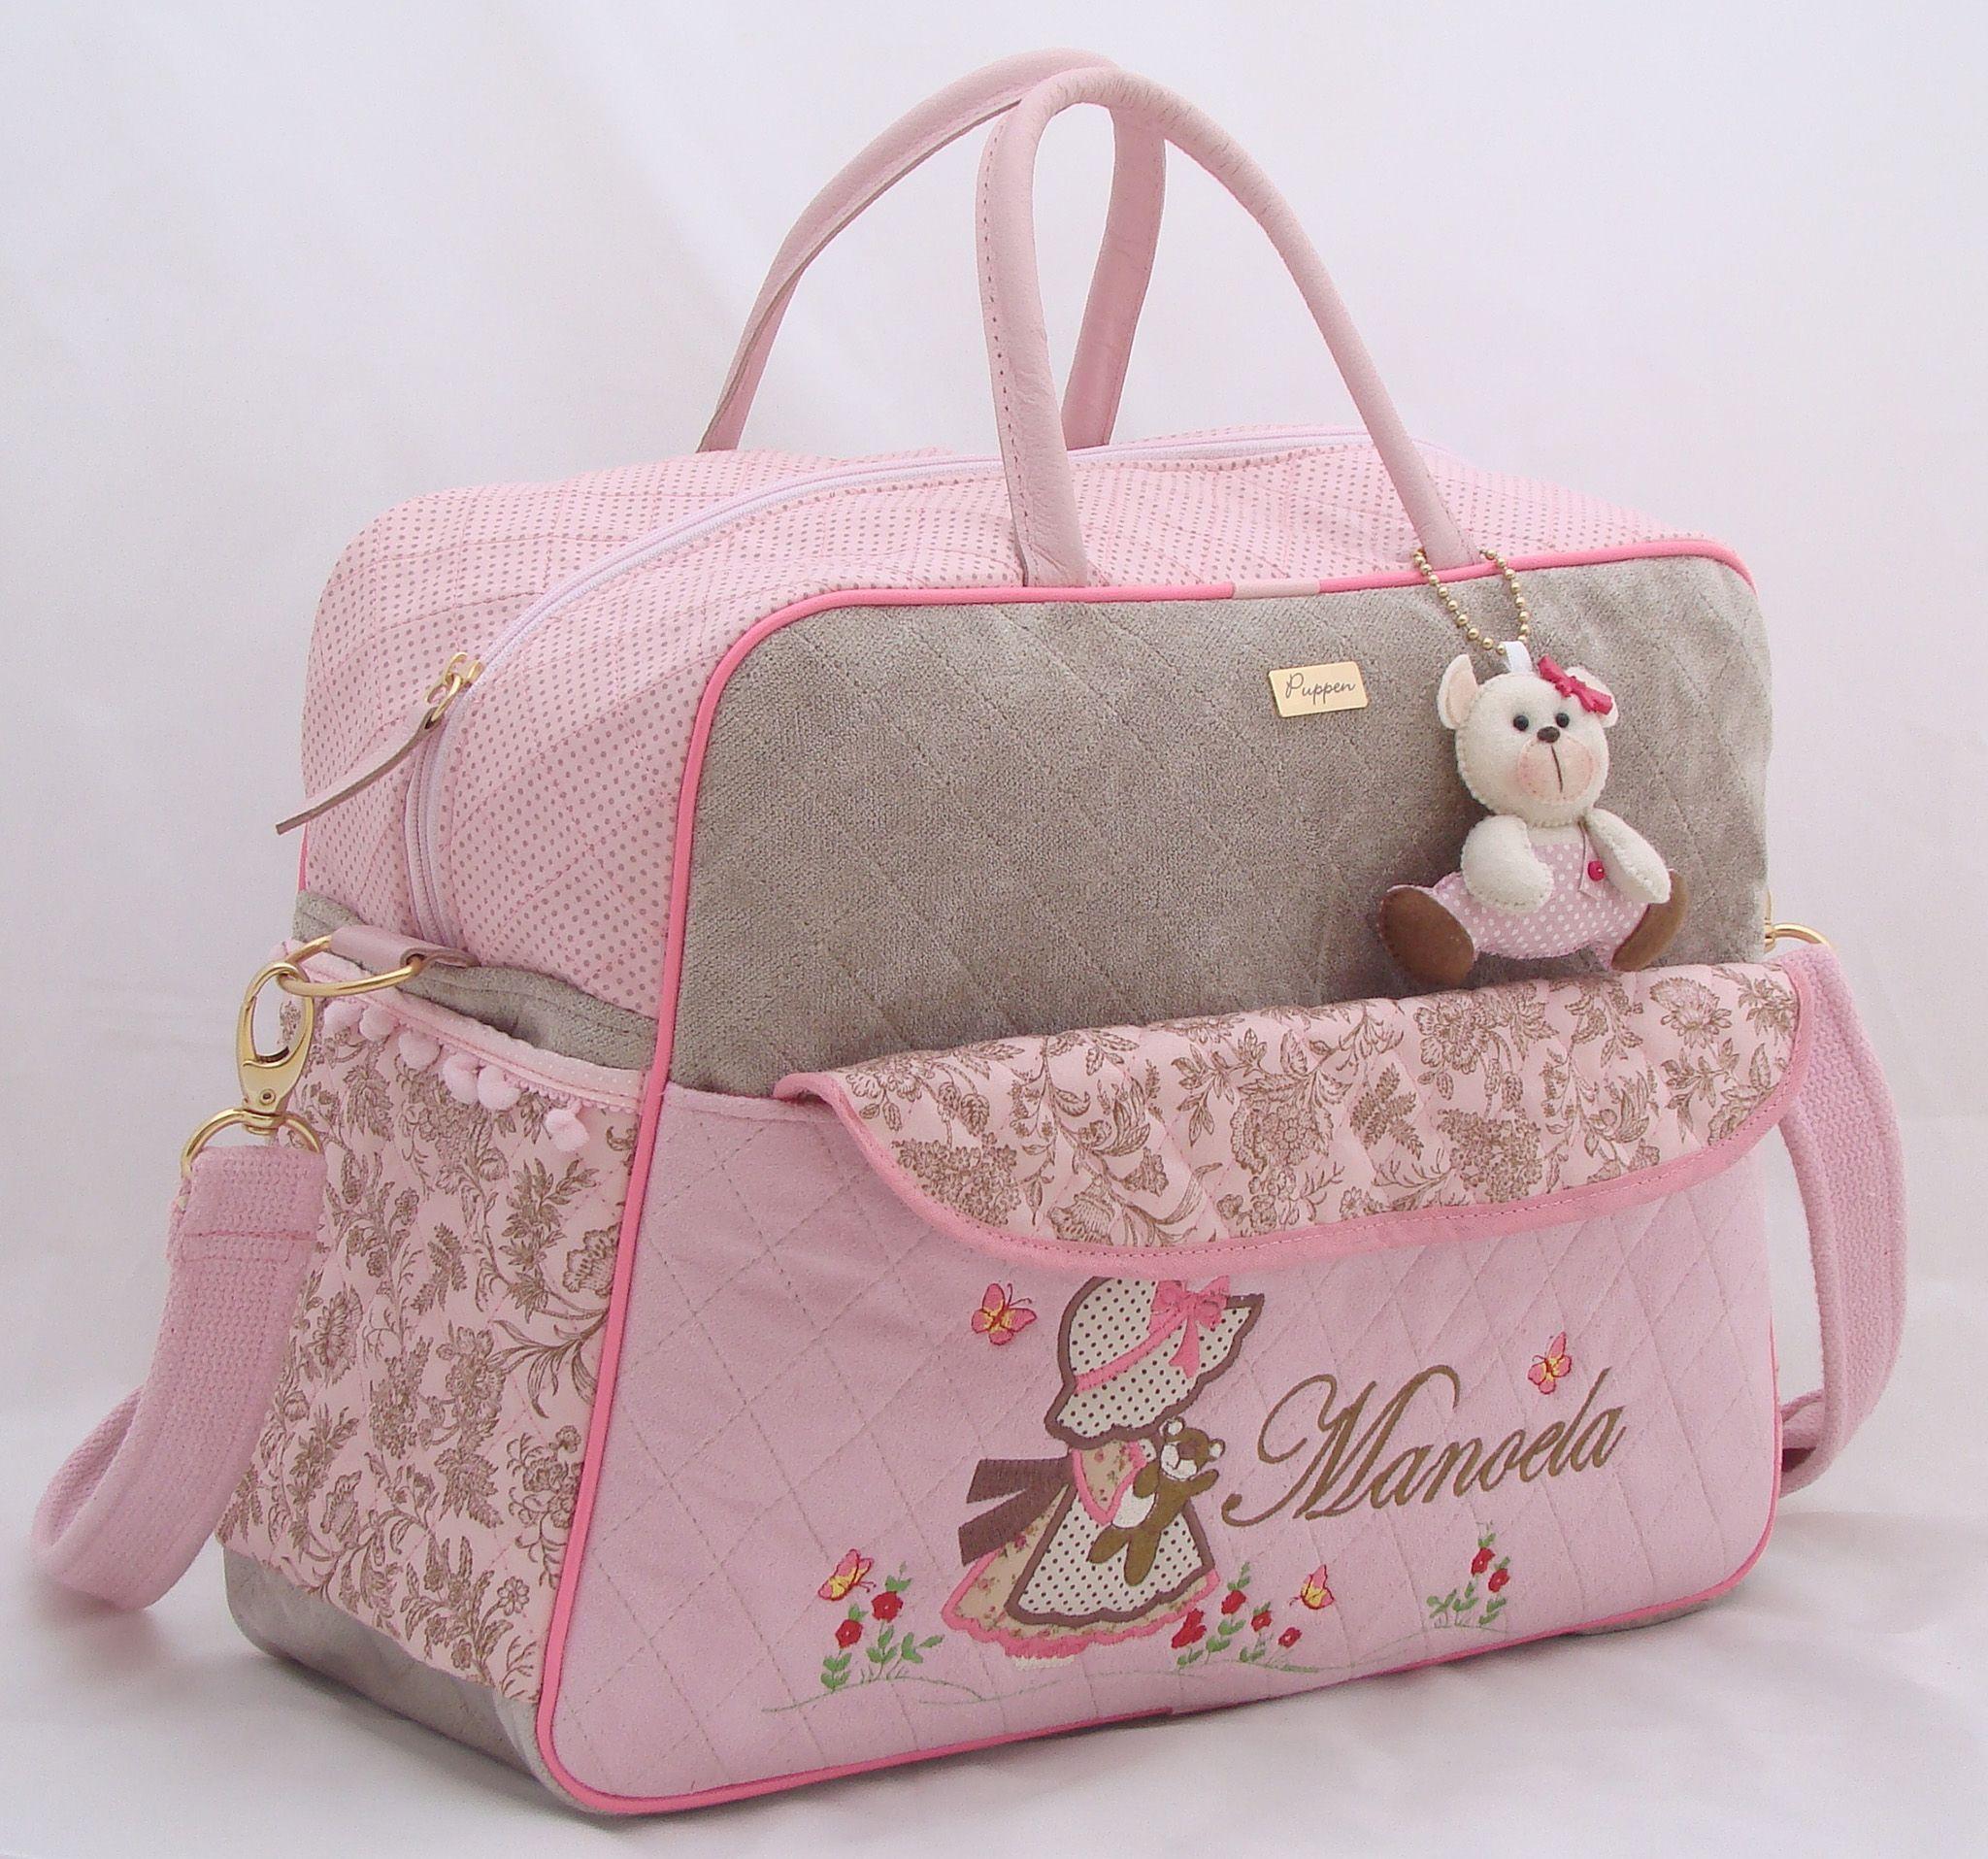 e33a658b8 Bolsa Maternidade www.puppen.com.br | PAÑALERAS | Baby diaper bags ...